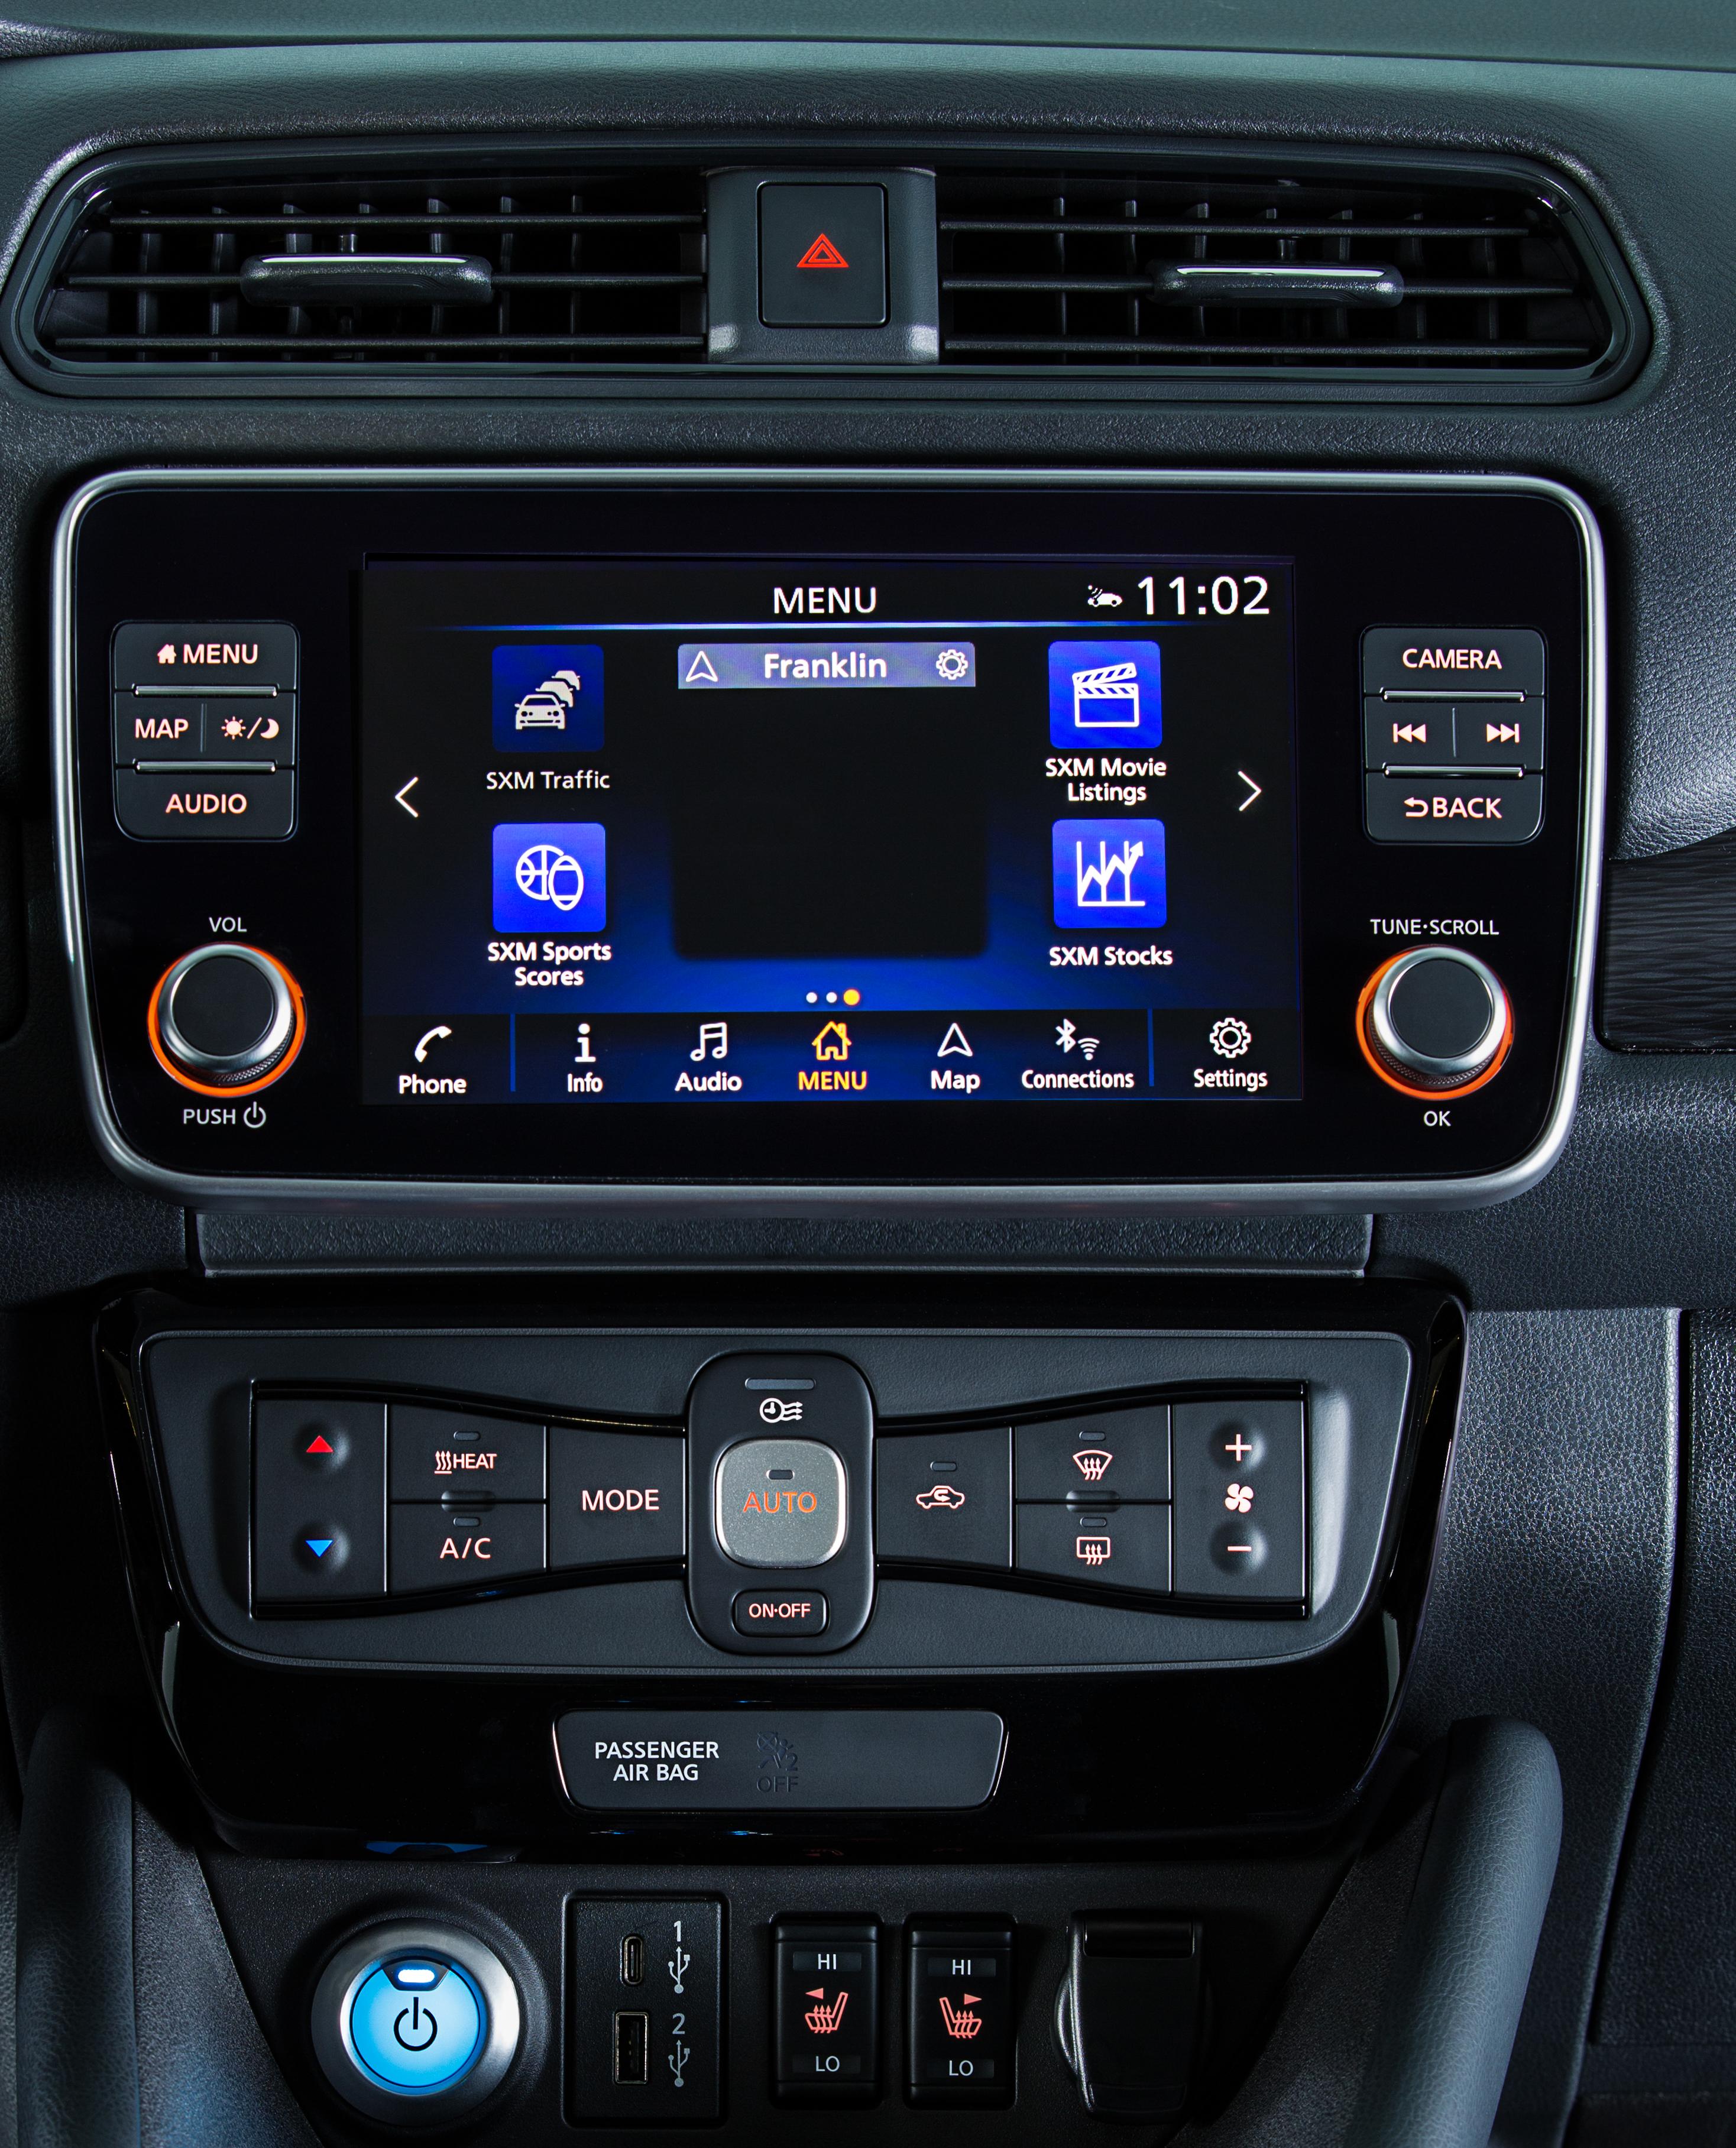 Nissan LEAF infotainment screen